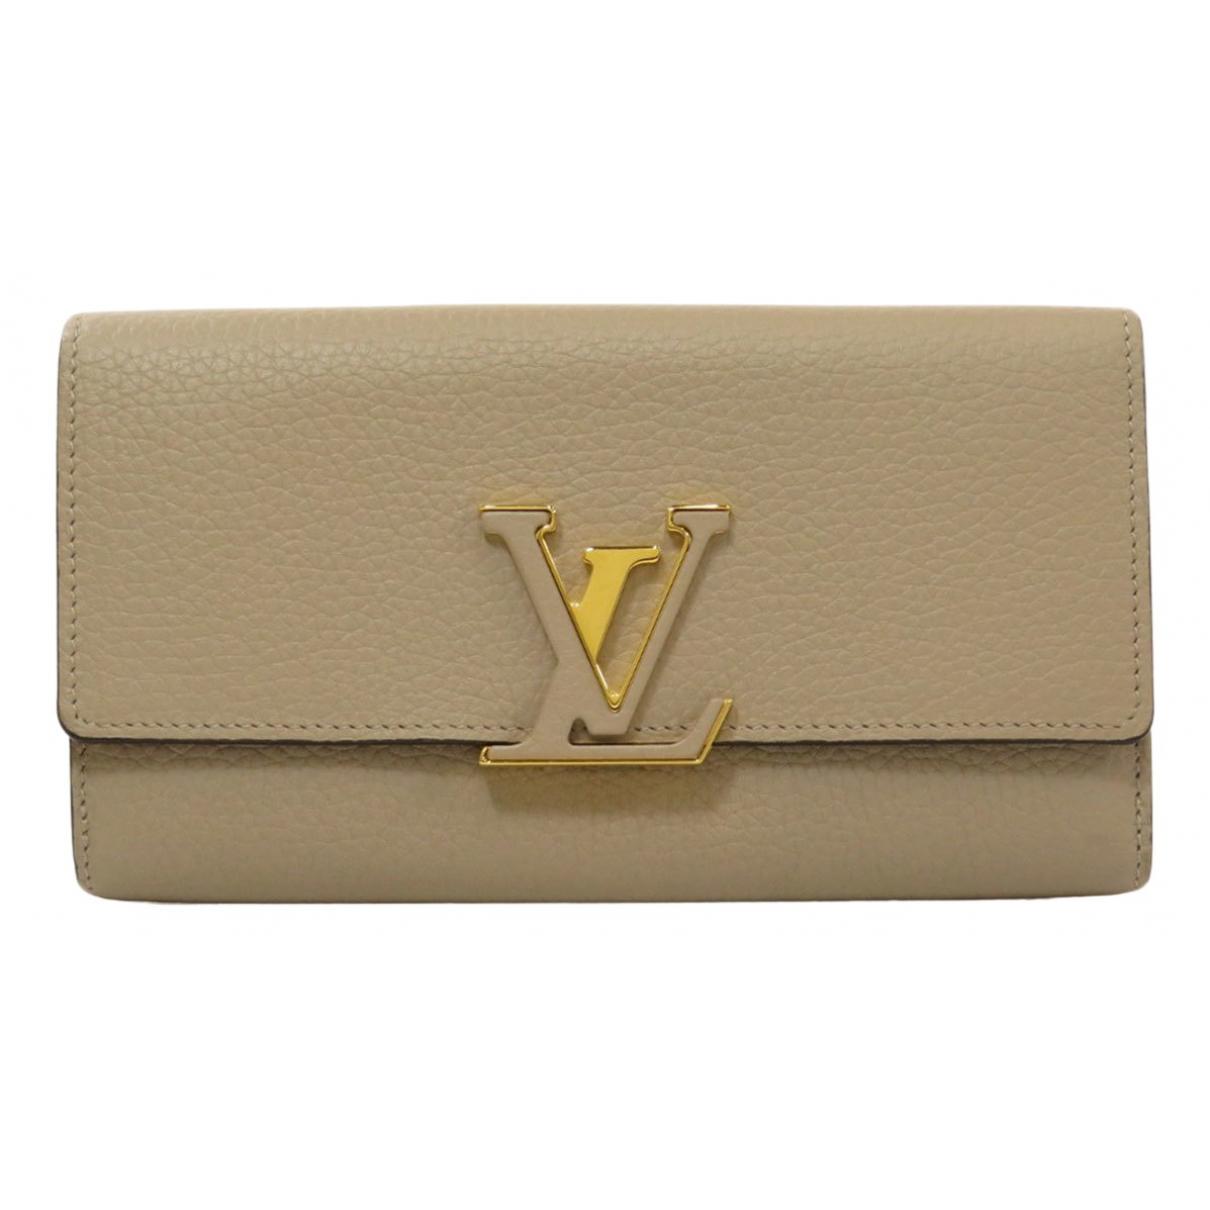 Louis Vuitton Capucines Portemonnaie in  Beige Leder